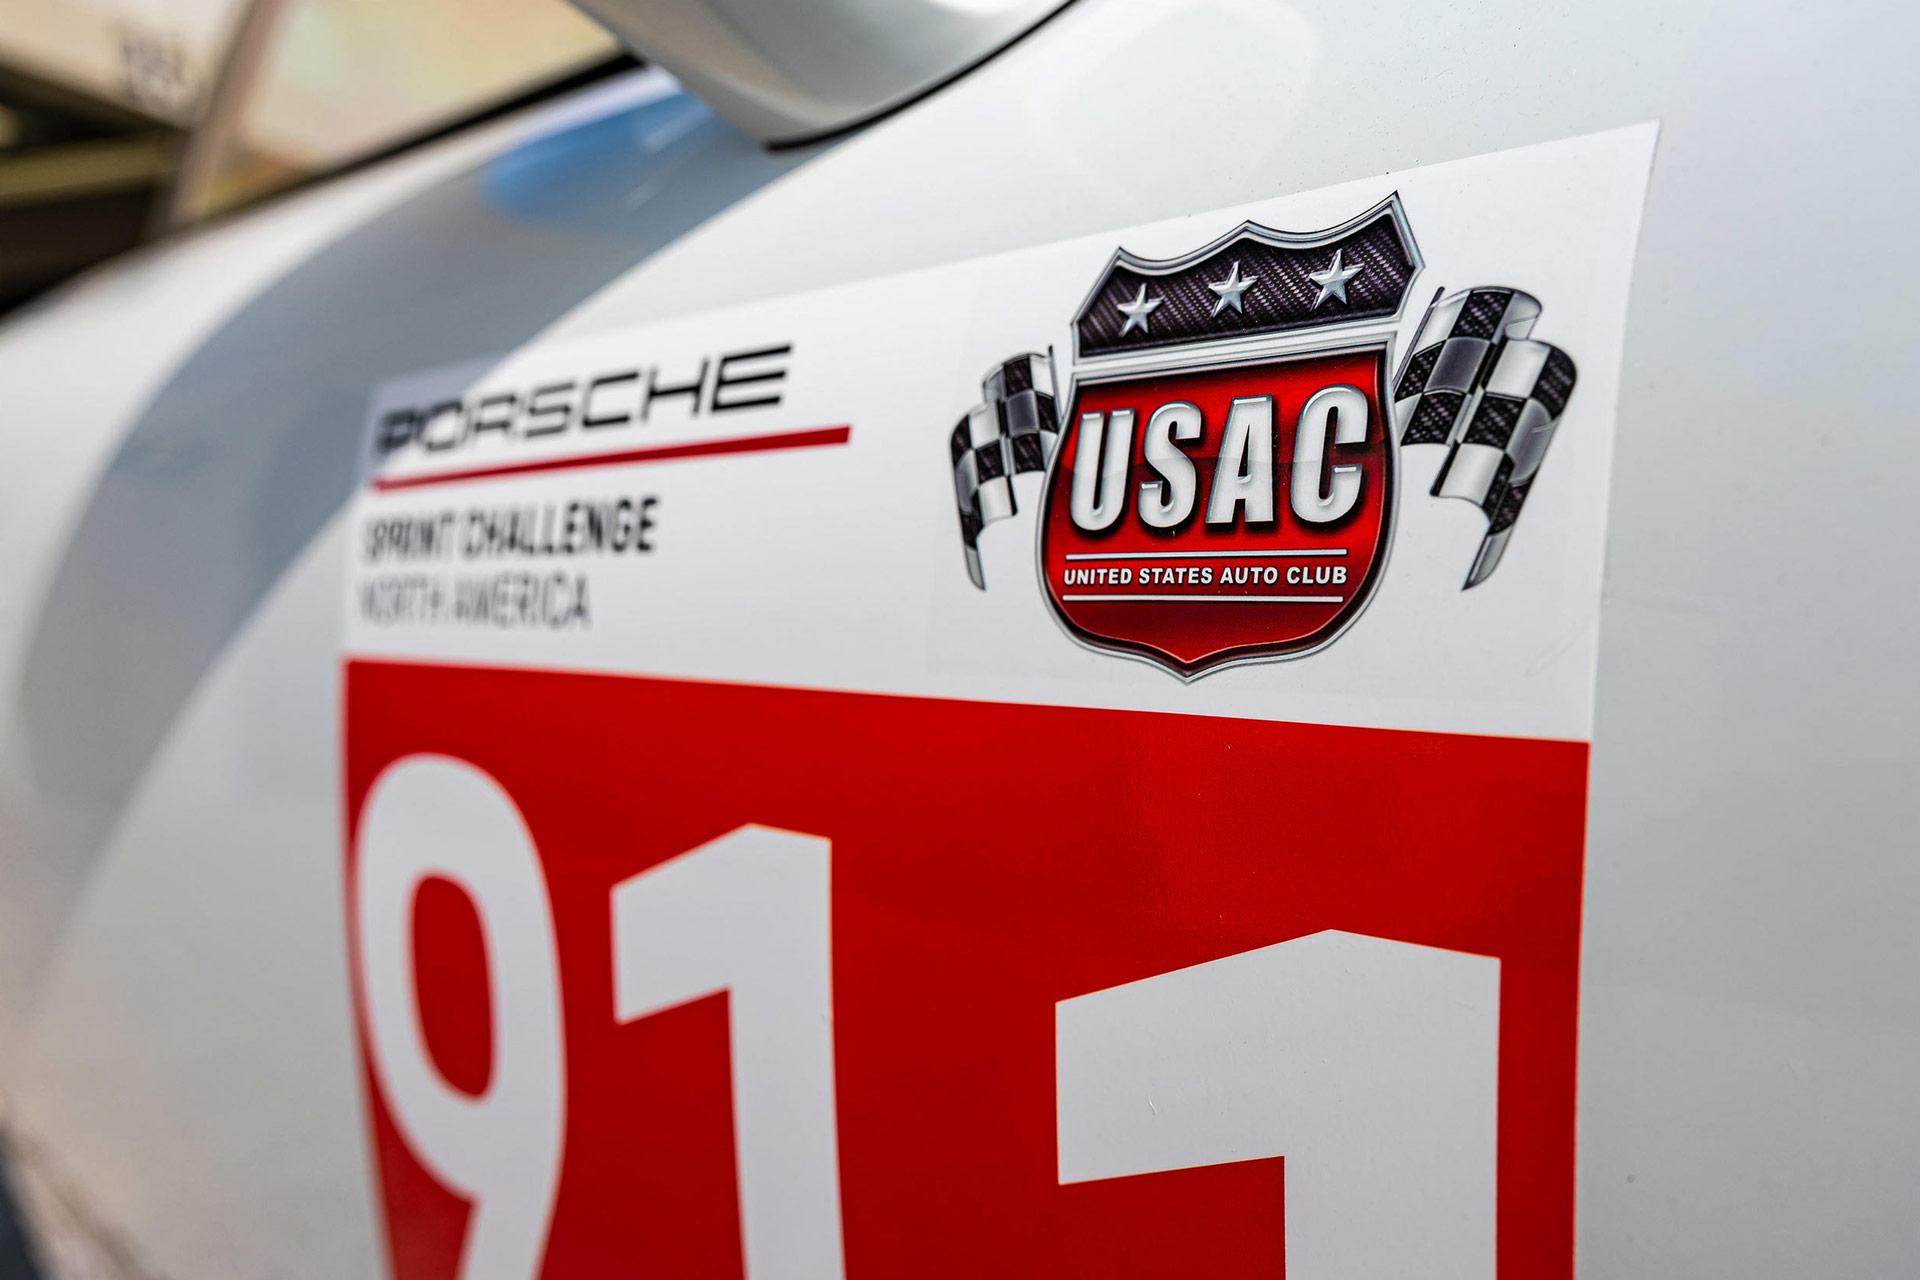 PSCNA USAC logo image